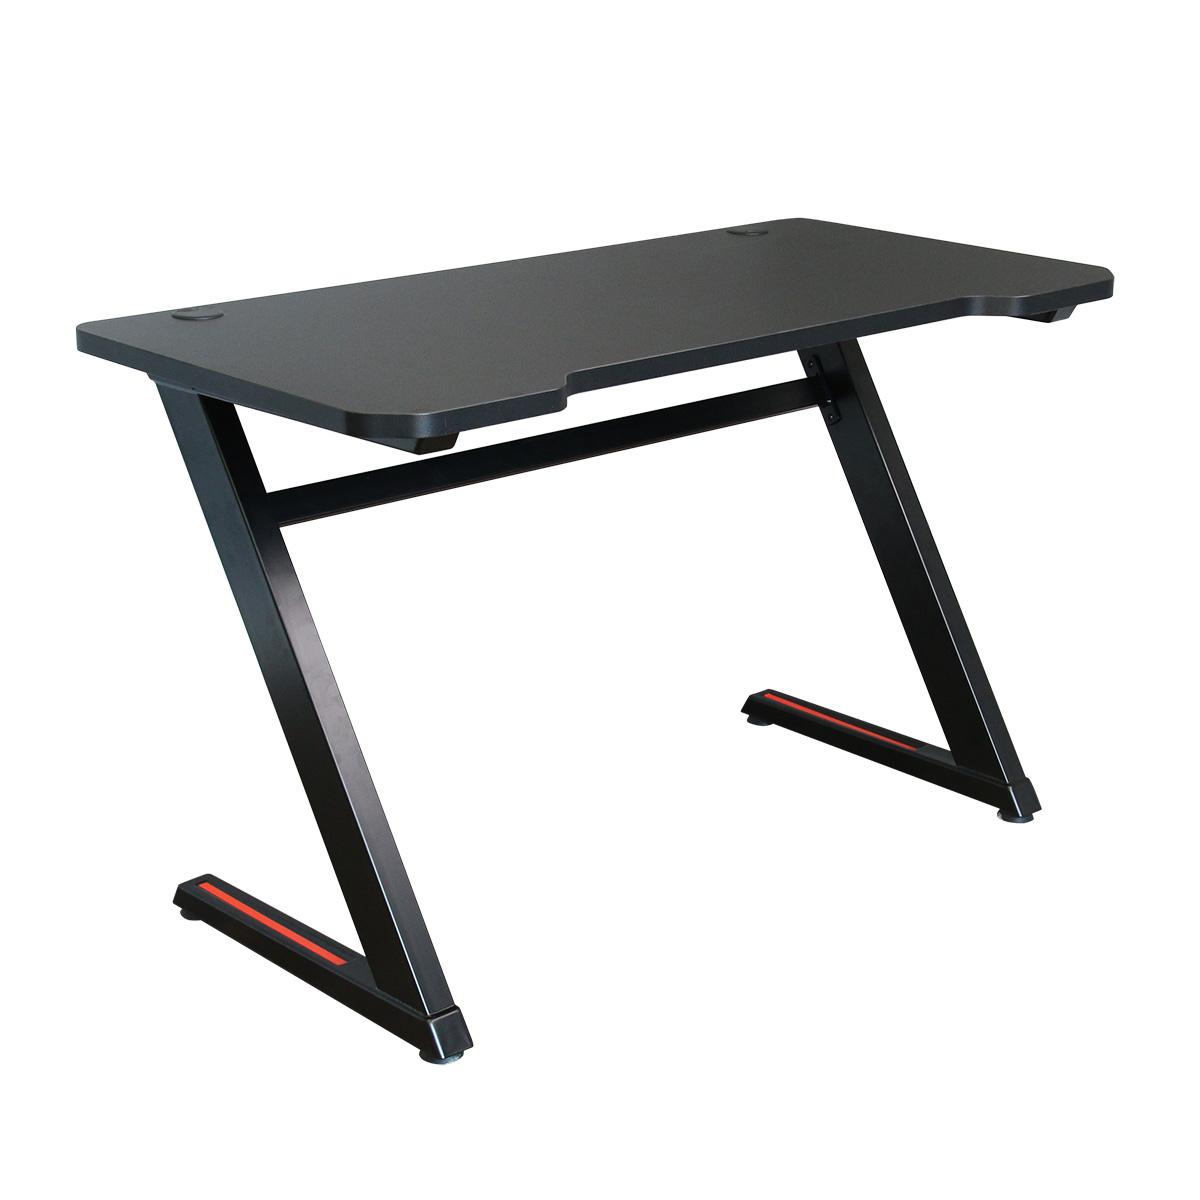 PC Gaming Desk 'Z' MKII – 'E'-Sports Ready (Stealth Black)